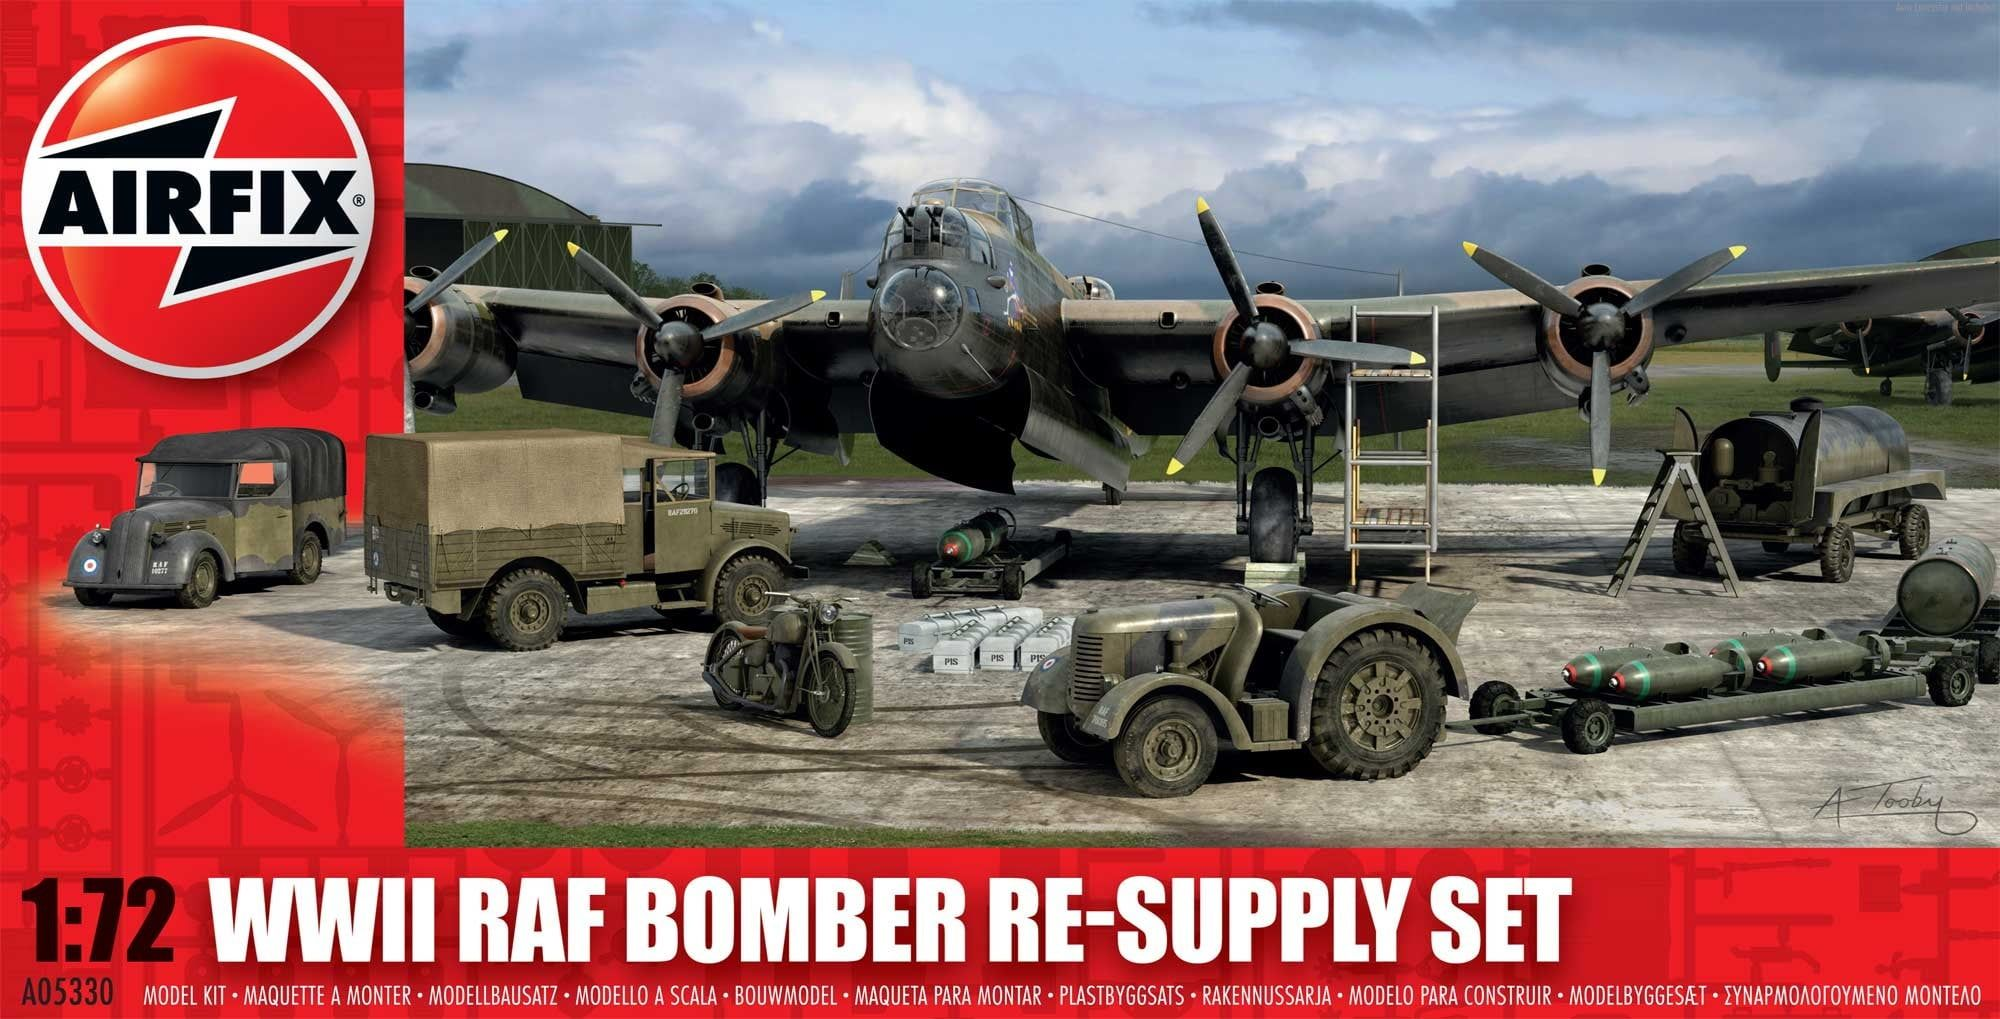 Airfix Bomber Re-supply Set 1:72 Scale Plastic Model Kit